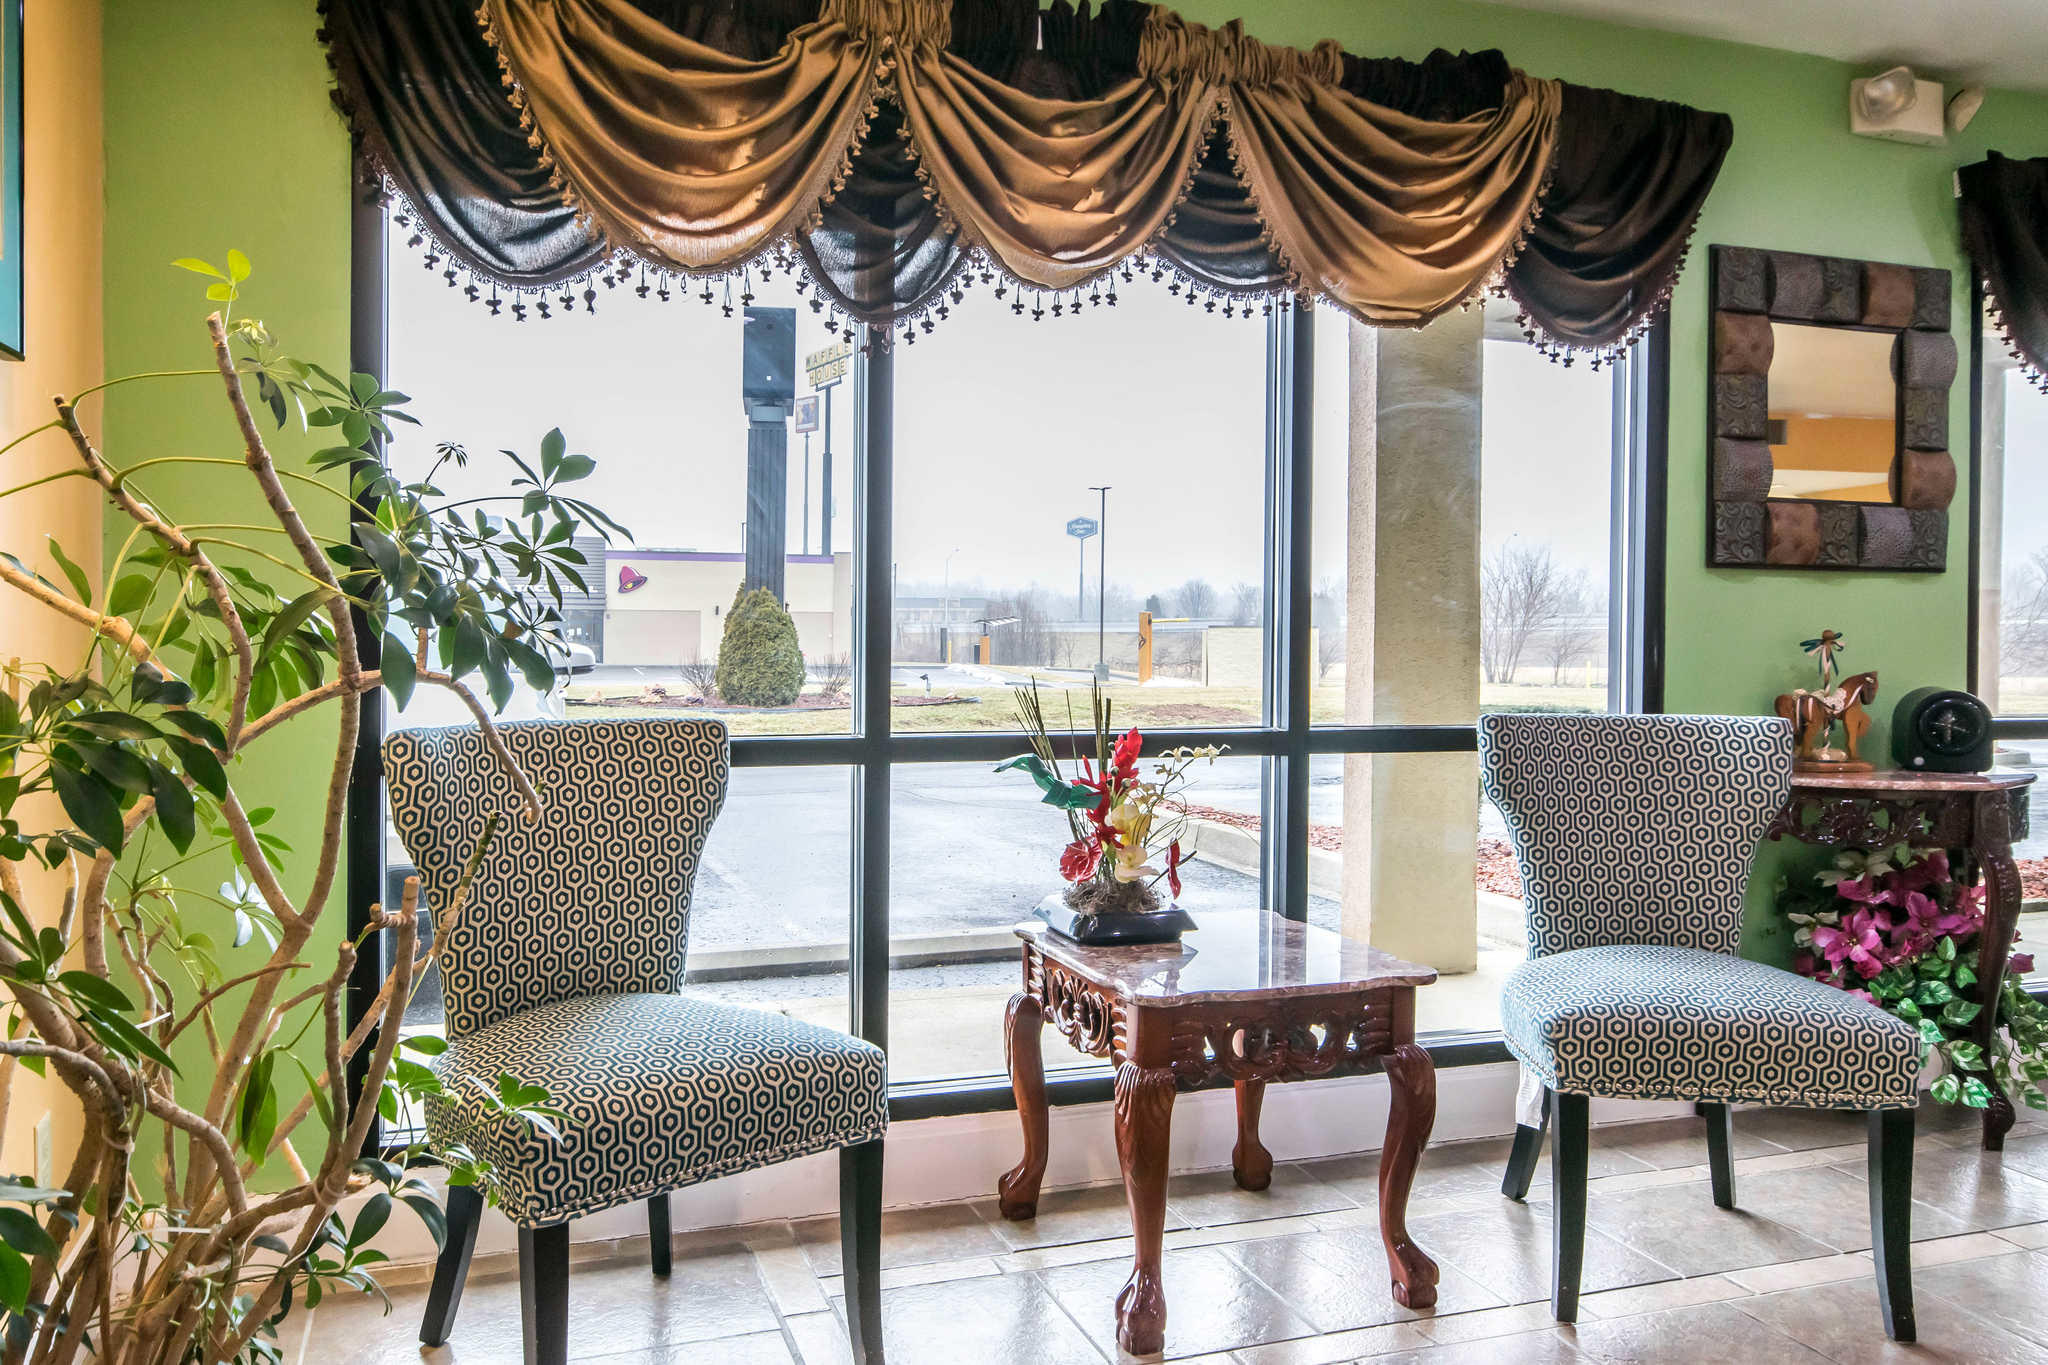 Econo Lodge Inn & Suites I-65 image 6